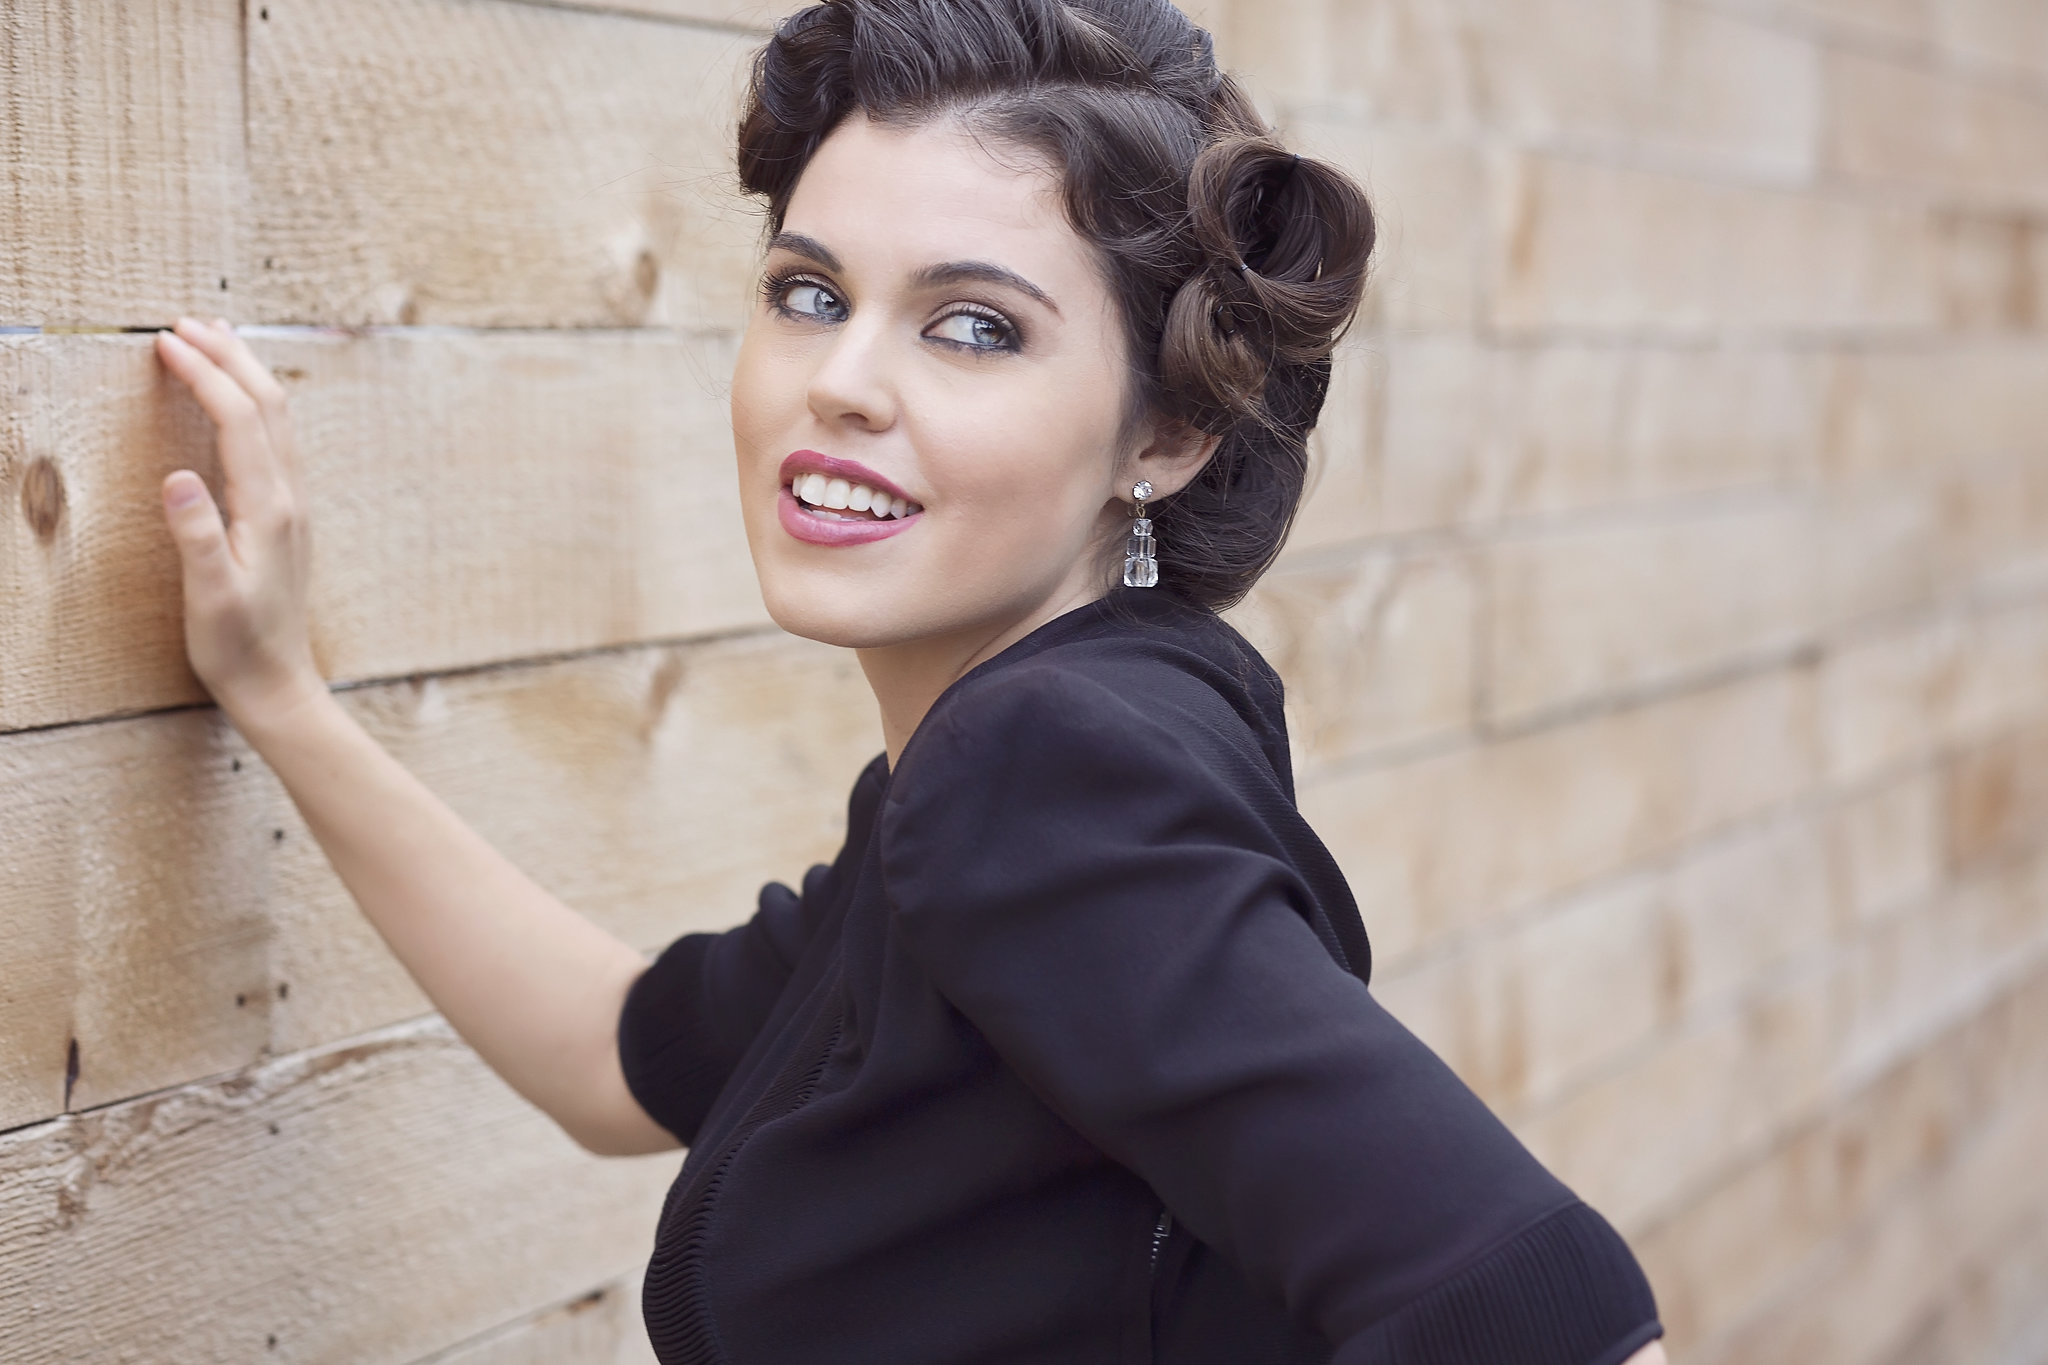 Arielle Lewis Photography. Portrait. Makeup. https://www.ariellelewis.studio/